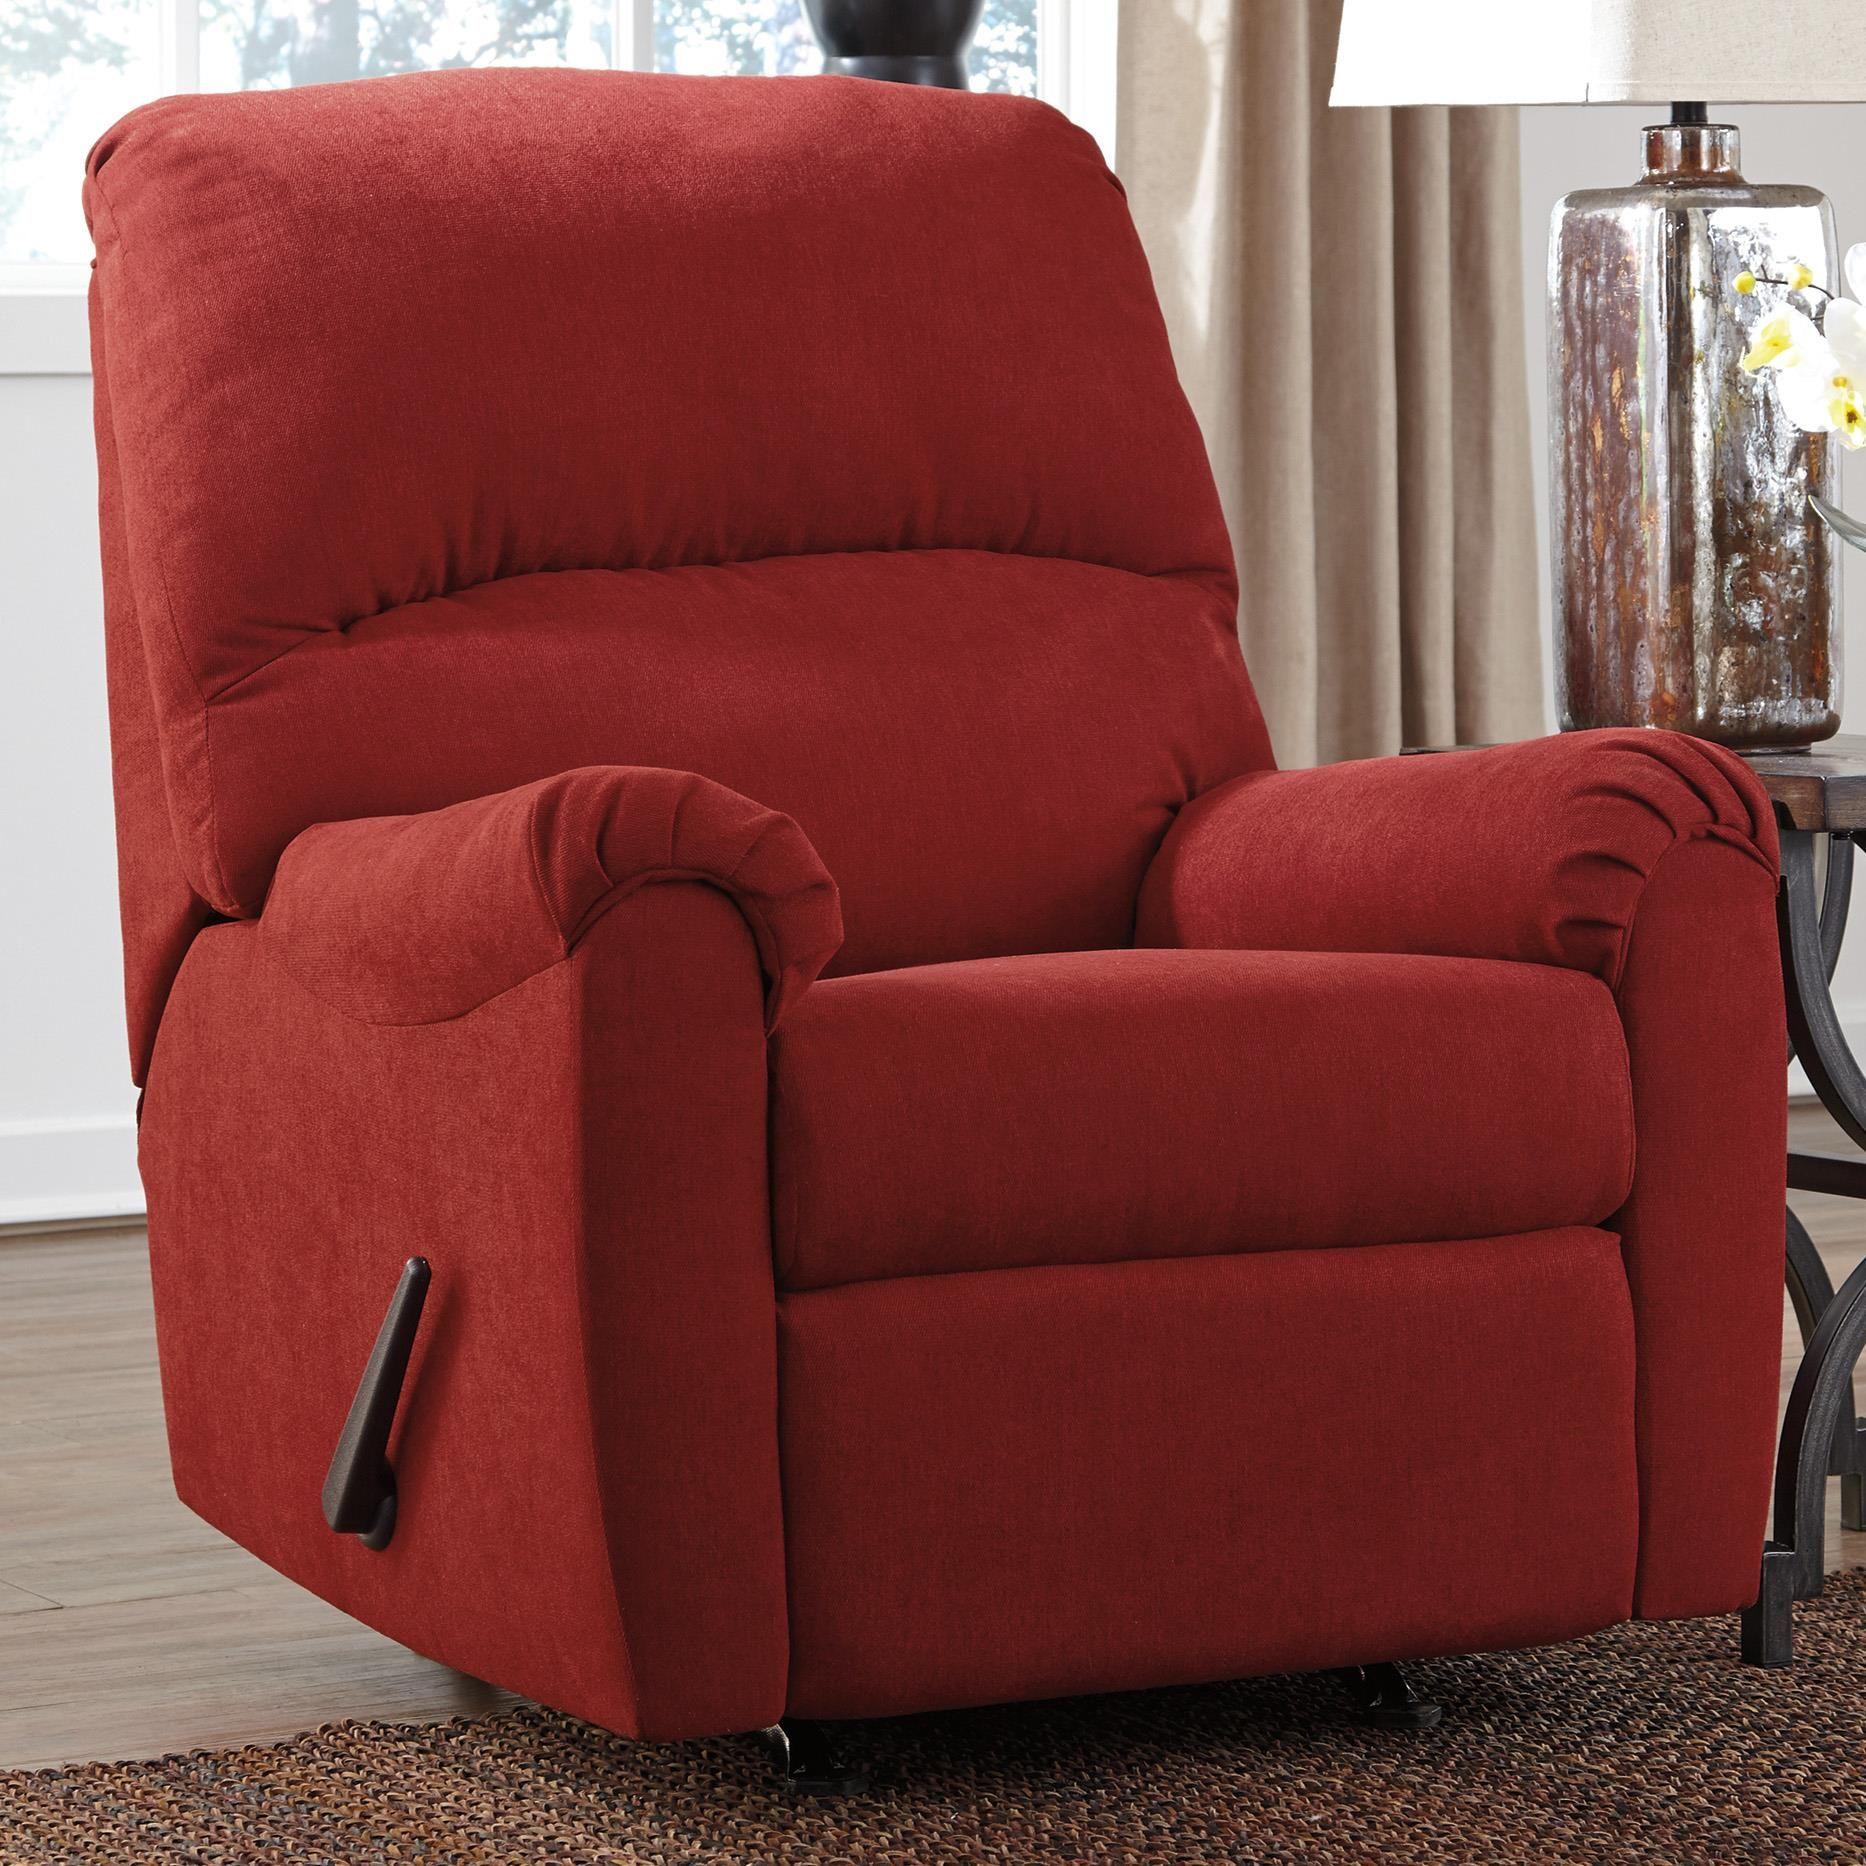 Zeth Crimson Casual Contemporary Rocker Recliner By Signature Design By Ashley At Speedy Furniture Rocker Recliners Recliner Furniture